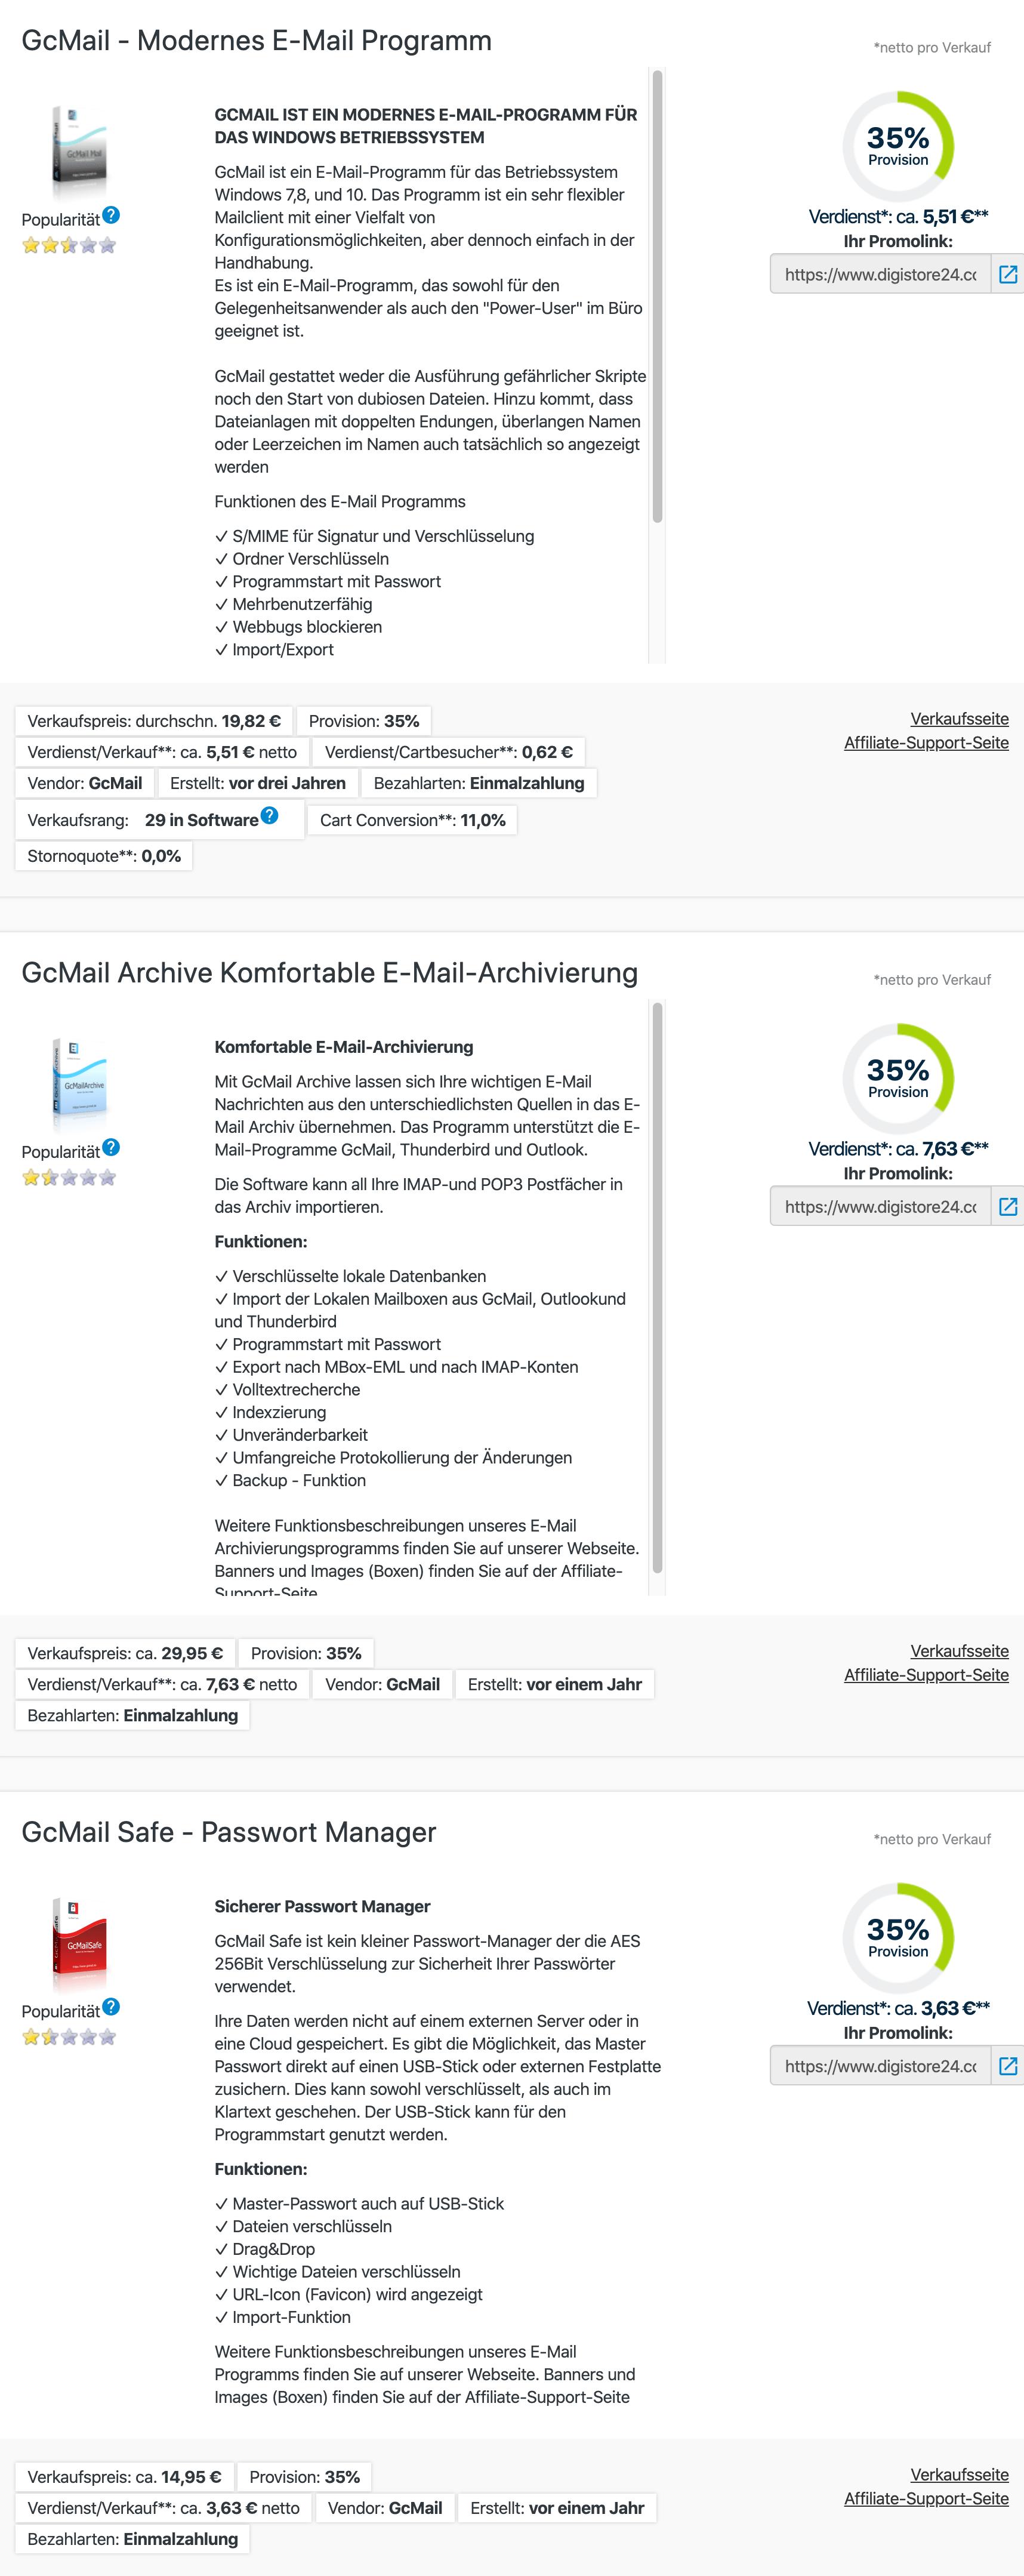 GcMailpartnerprogramm